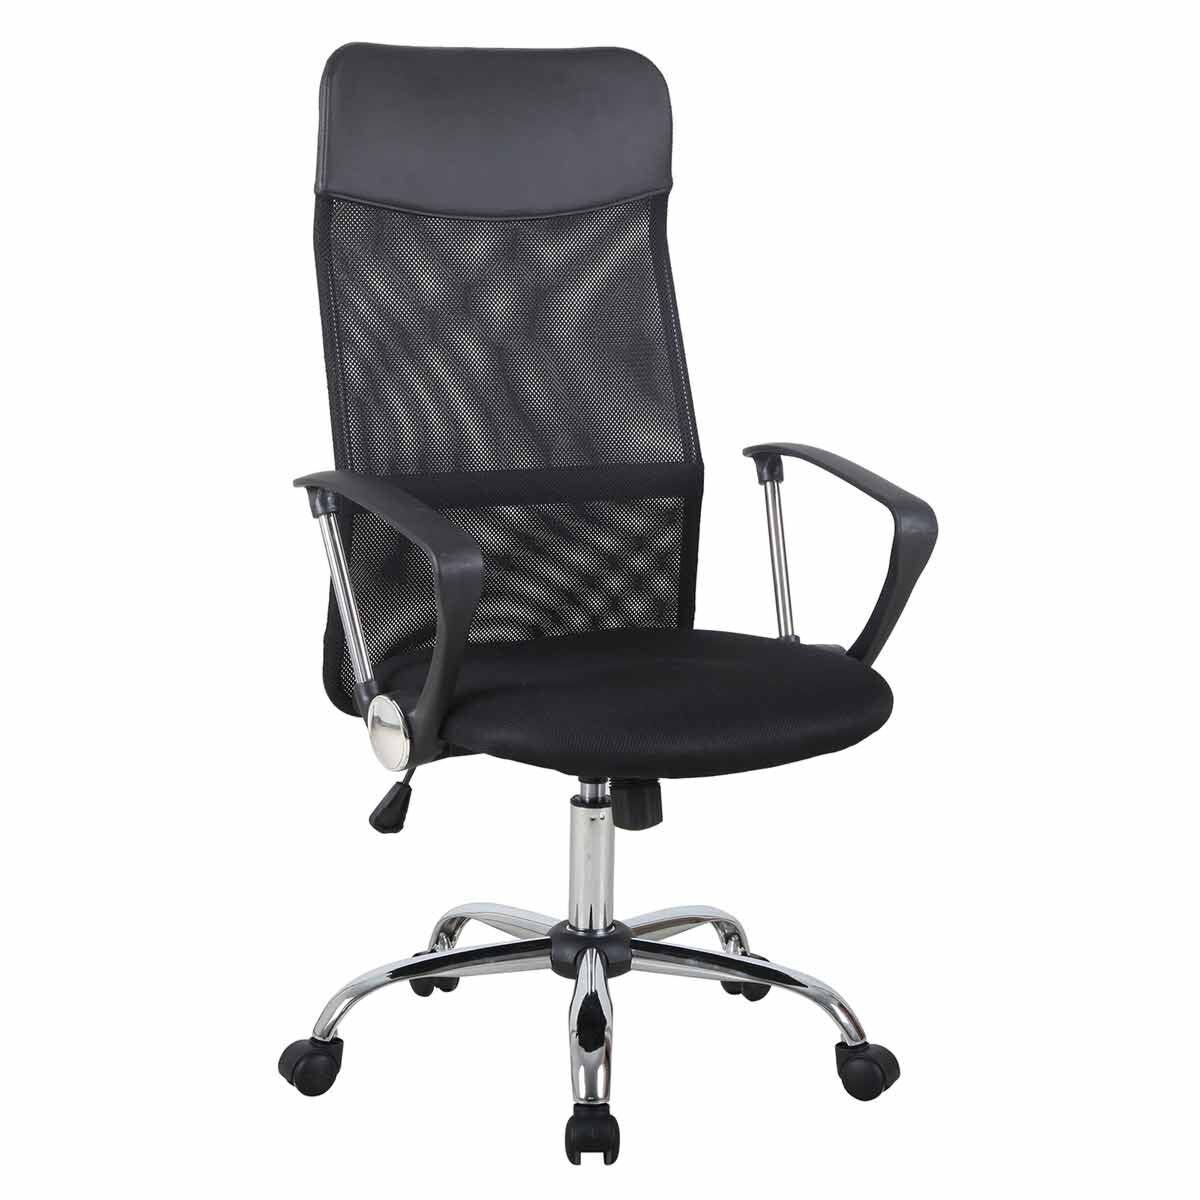 Vivienne Executive Mesh Office Chair